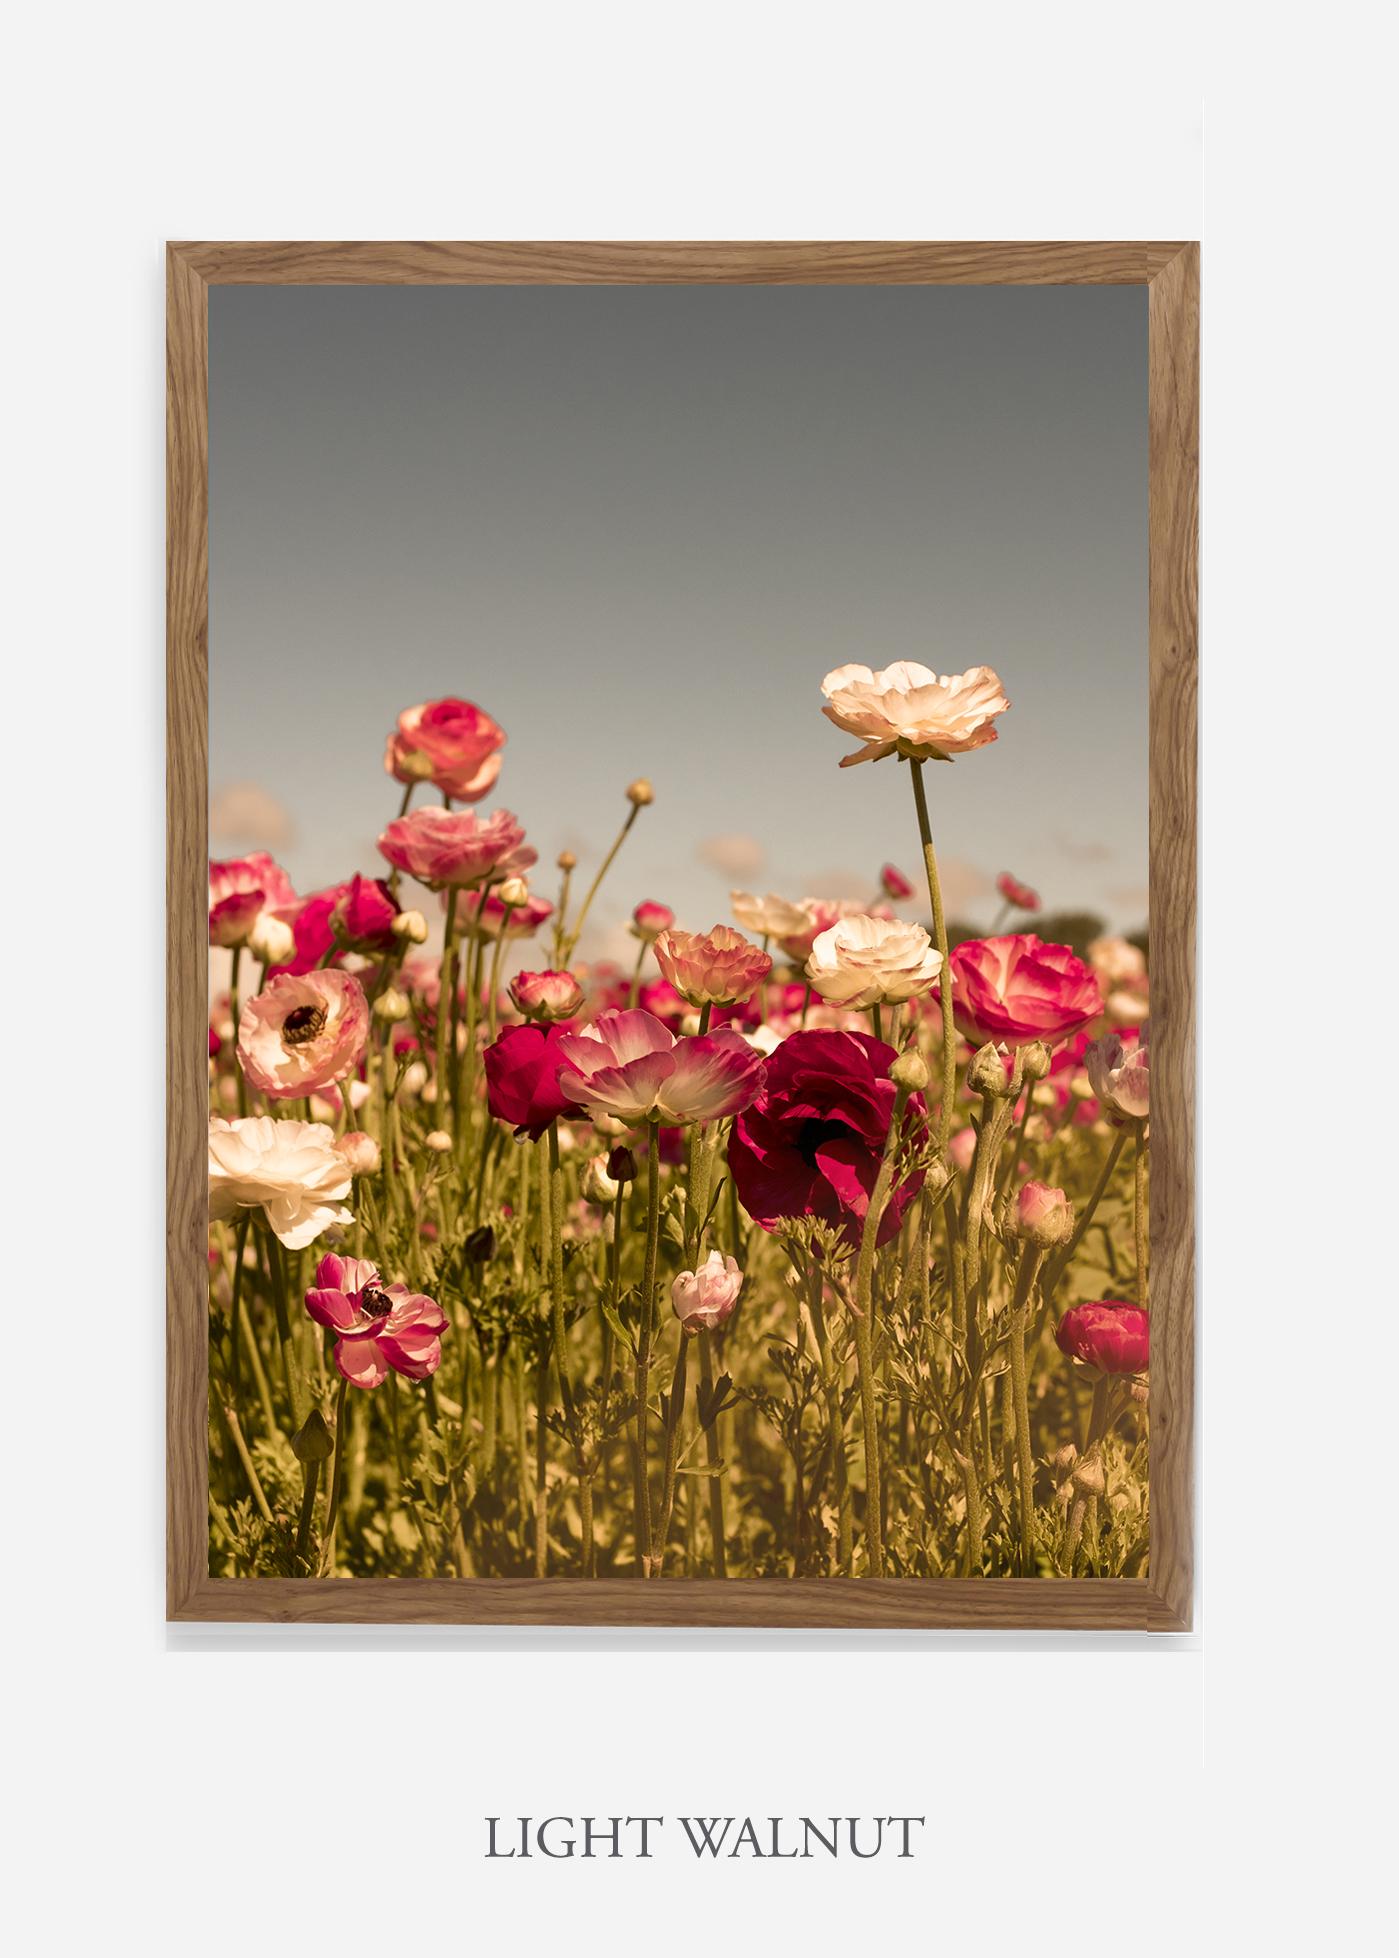 wilder-california-Floral-No.3-light-walnut-frame-no-mat-interior-design-botanical-print-art-floral-art.jpg